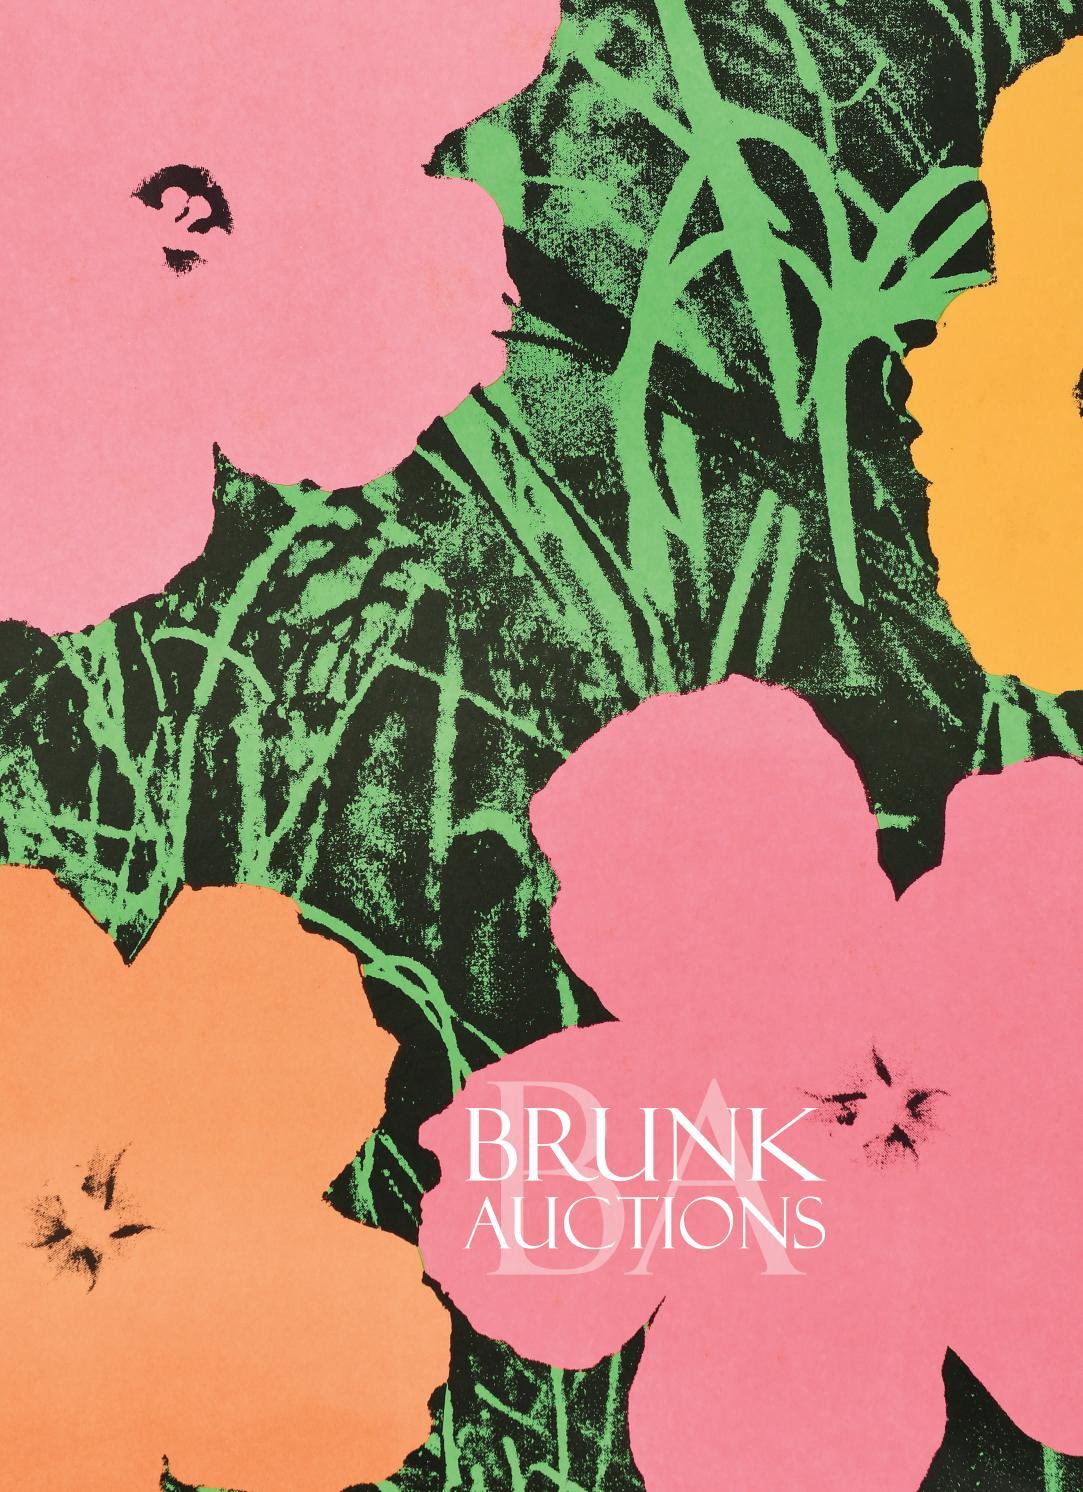 "NATIVE STATE MANY COLORS WASHINGTON HOME USA Vinyl Decal 4X6/"" LIME GREEN"